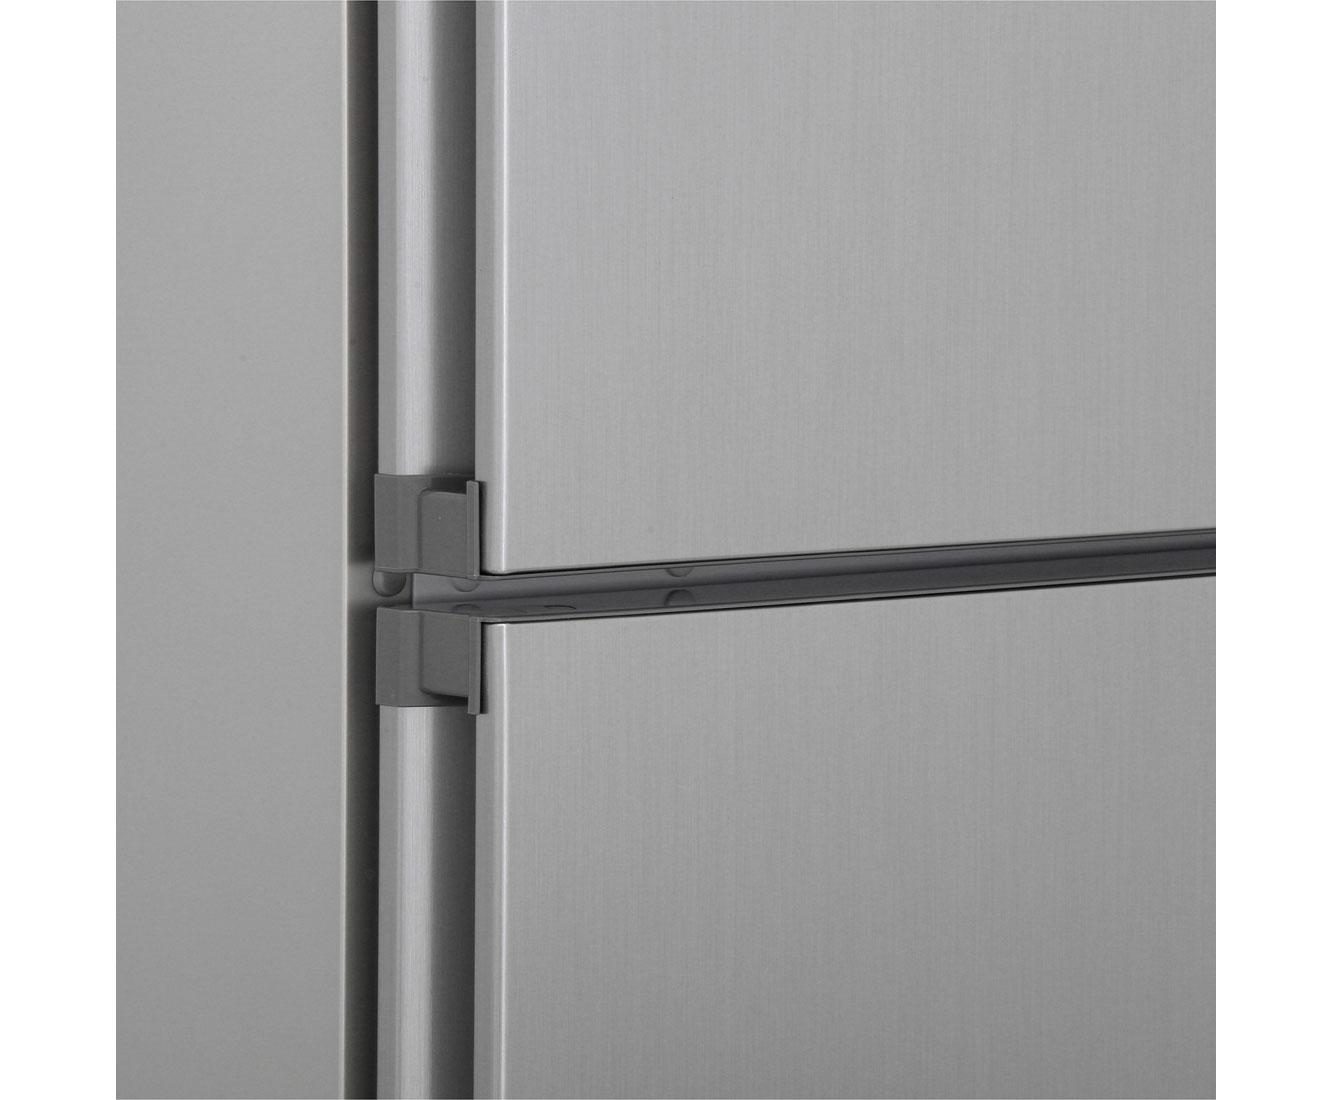 Siemens Kühlschrank Silber : Kühlschrank edelstahl freistehend siemens siemens kg ebi kühl